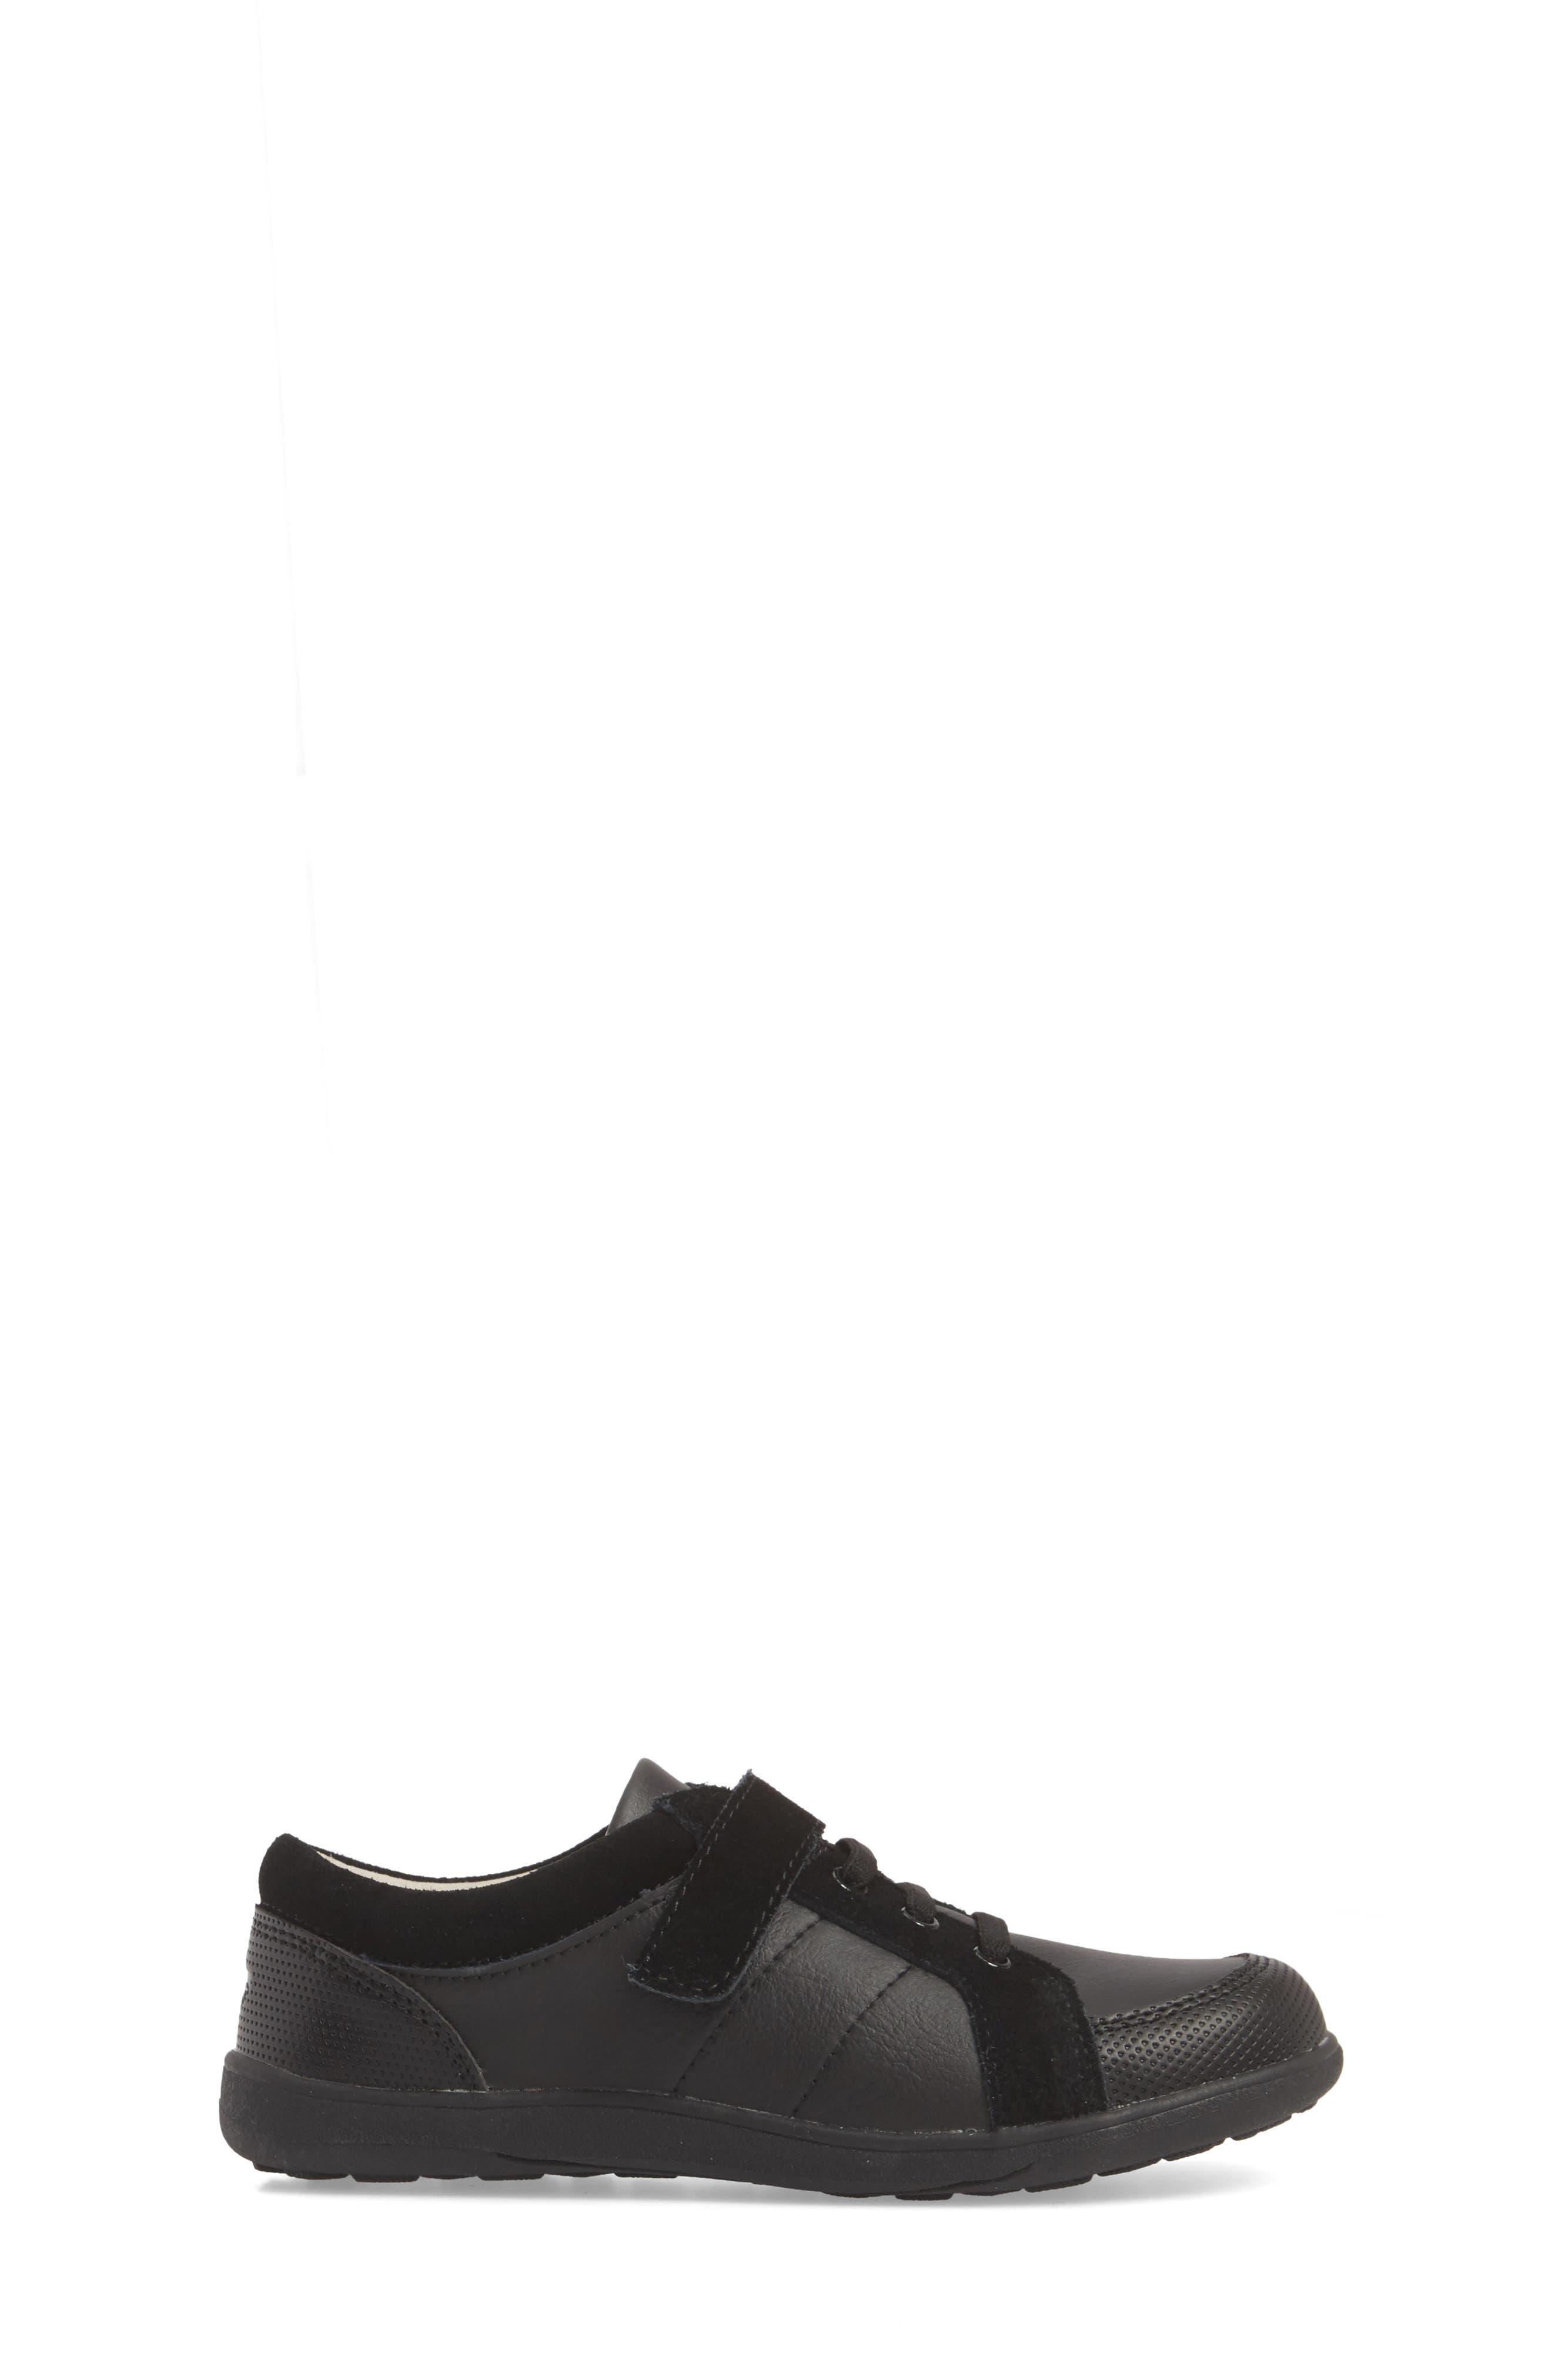 Randal III Sneaker,                             Alternate thumbnail 4, color,                             Black